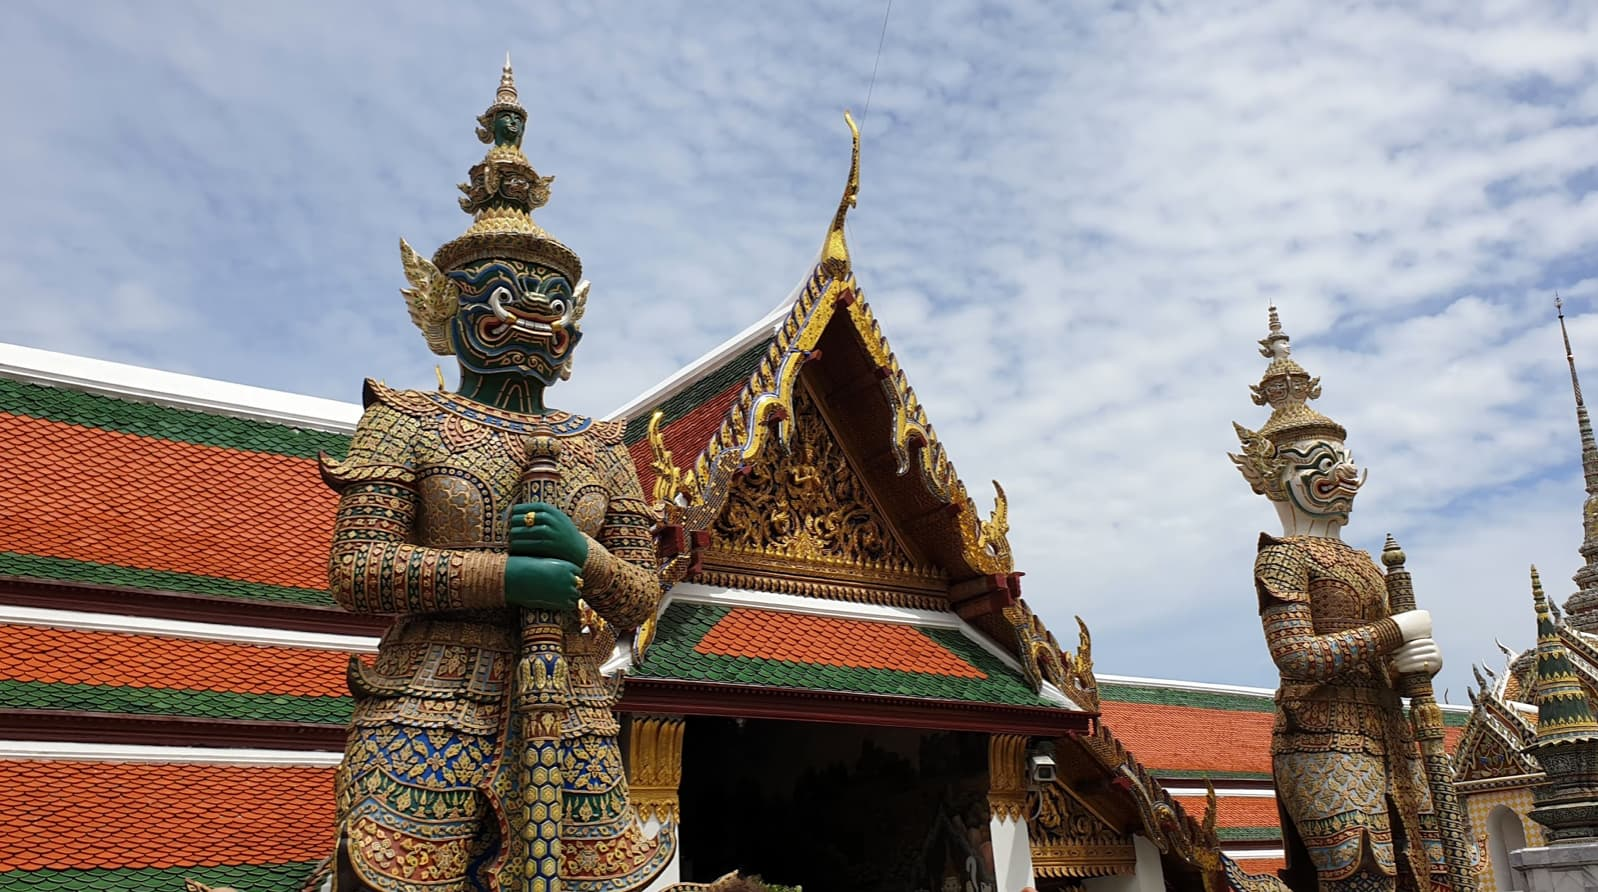 bangkok grandpalace タイ 王宮